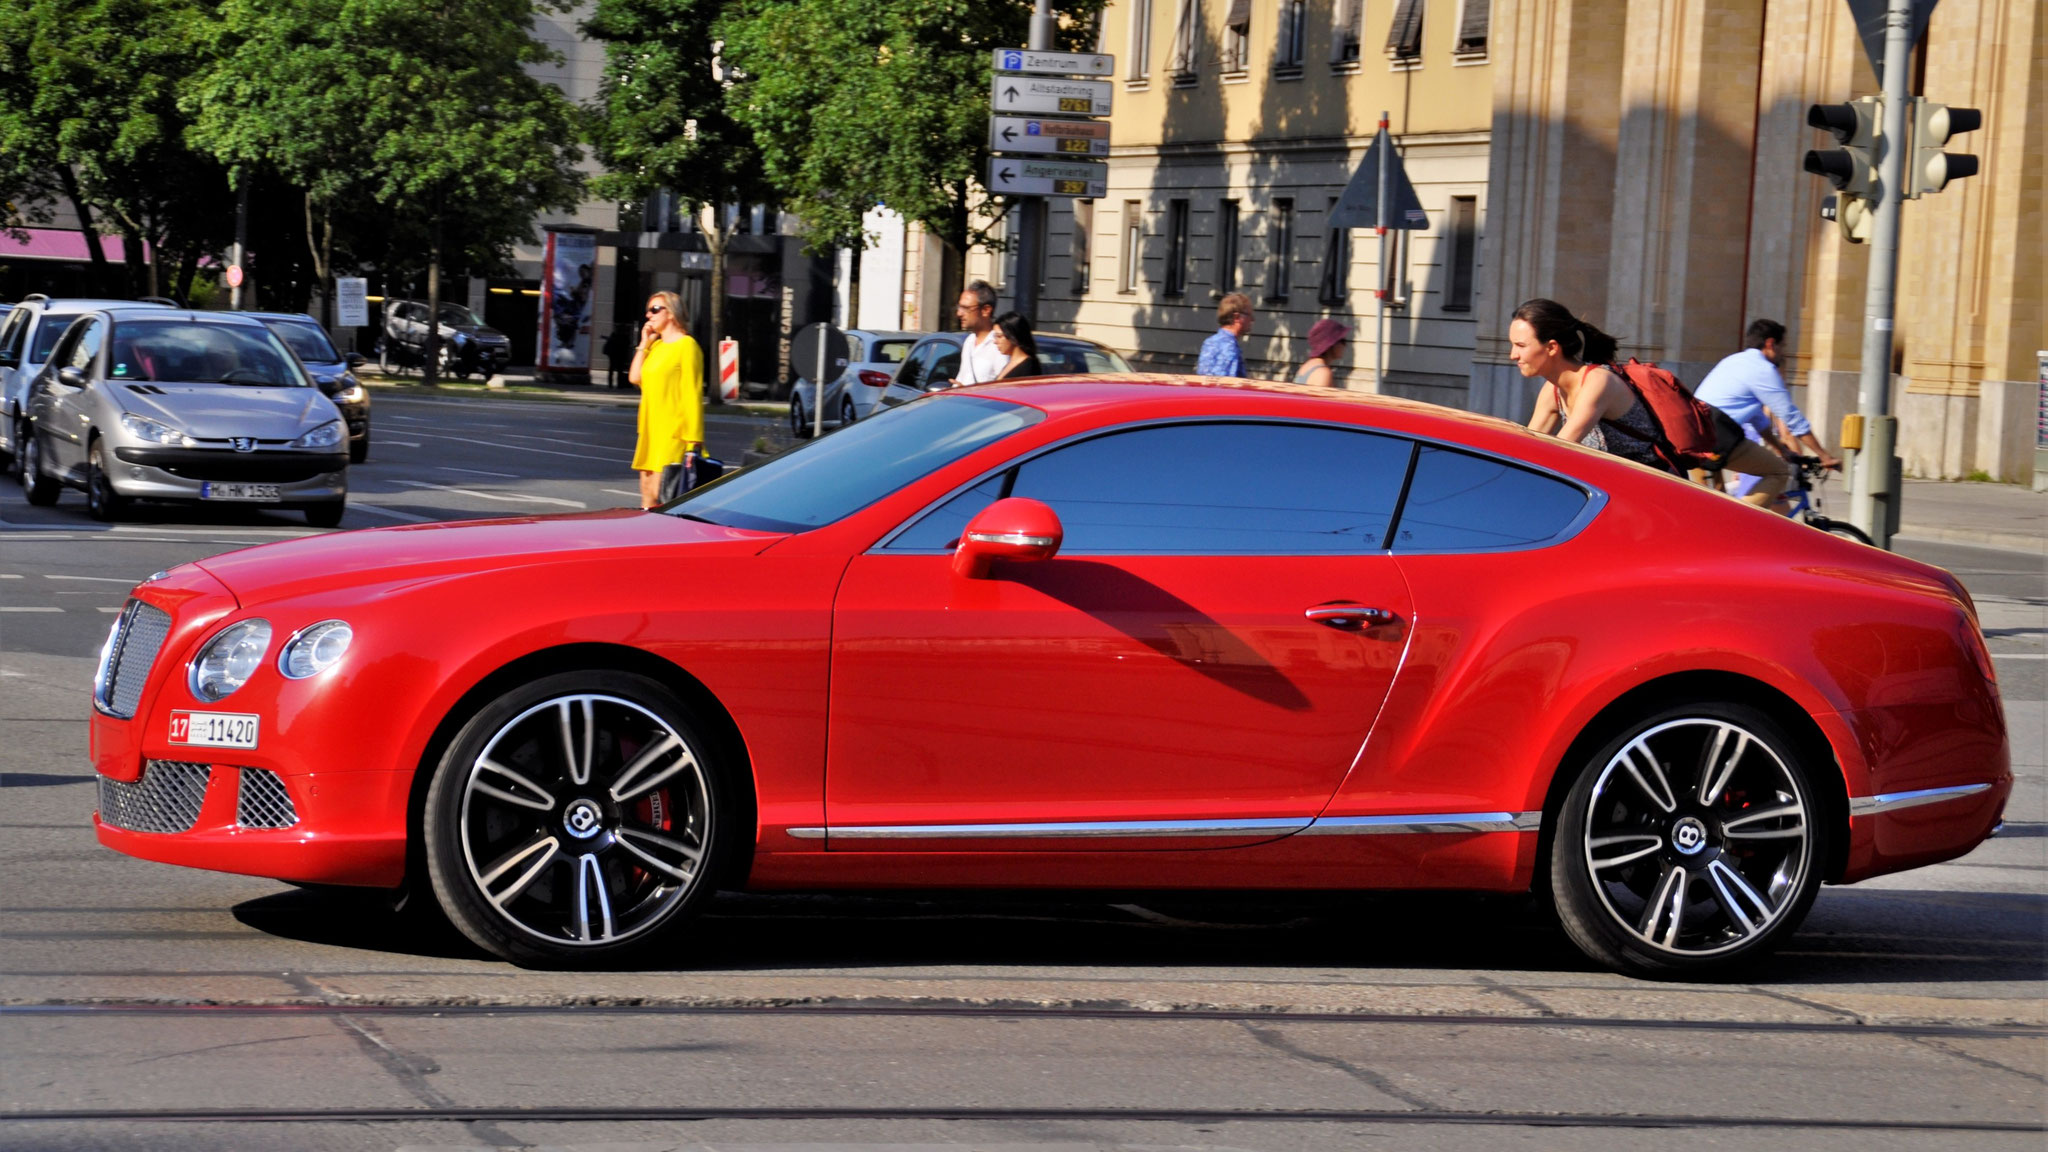 Bentley Continental GT - 17-11420 (UAEAD)